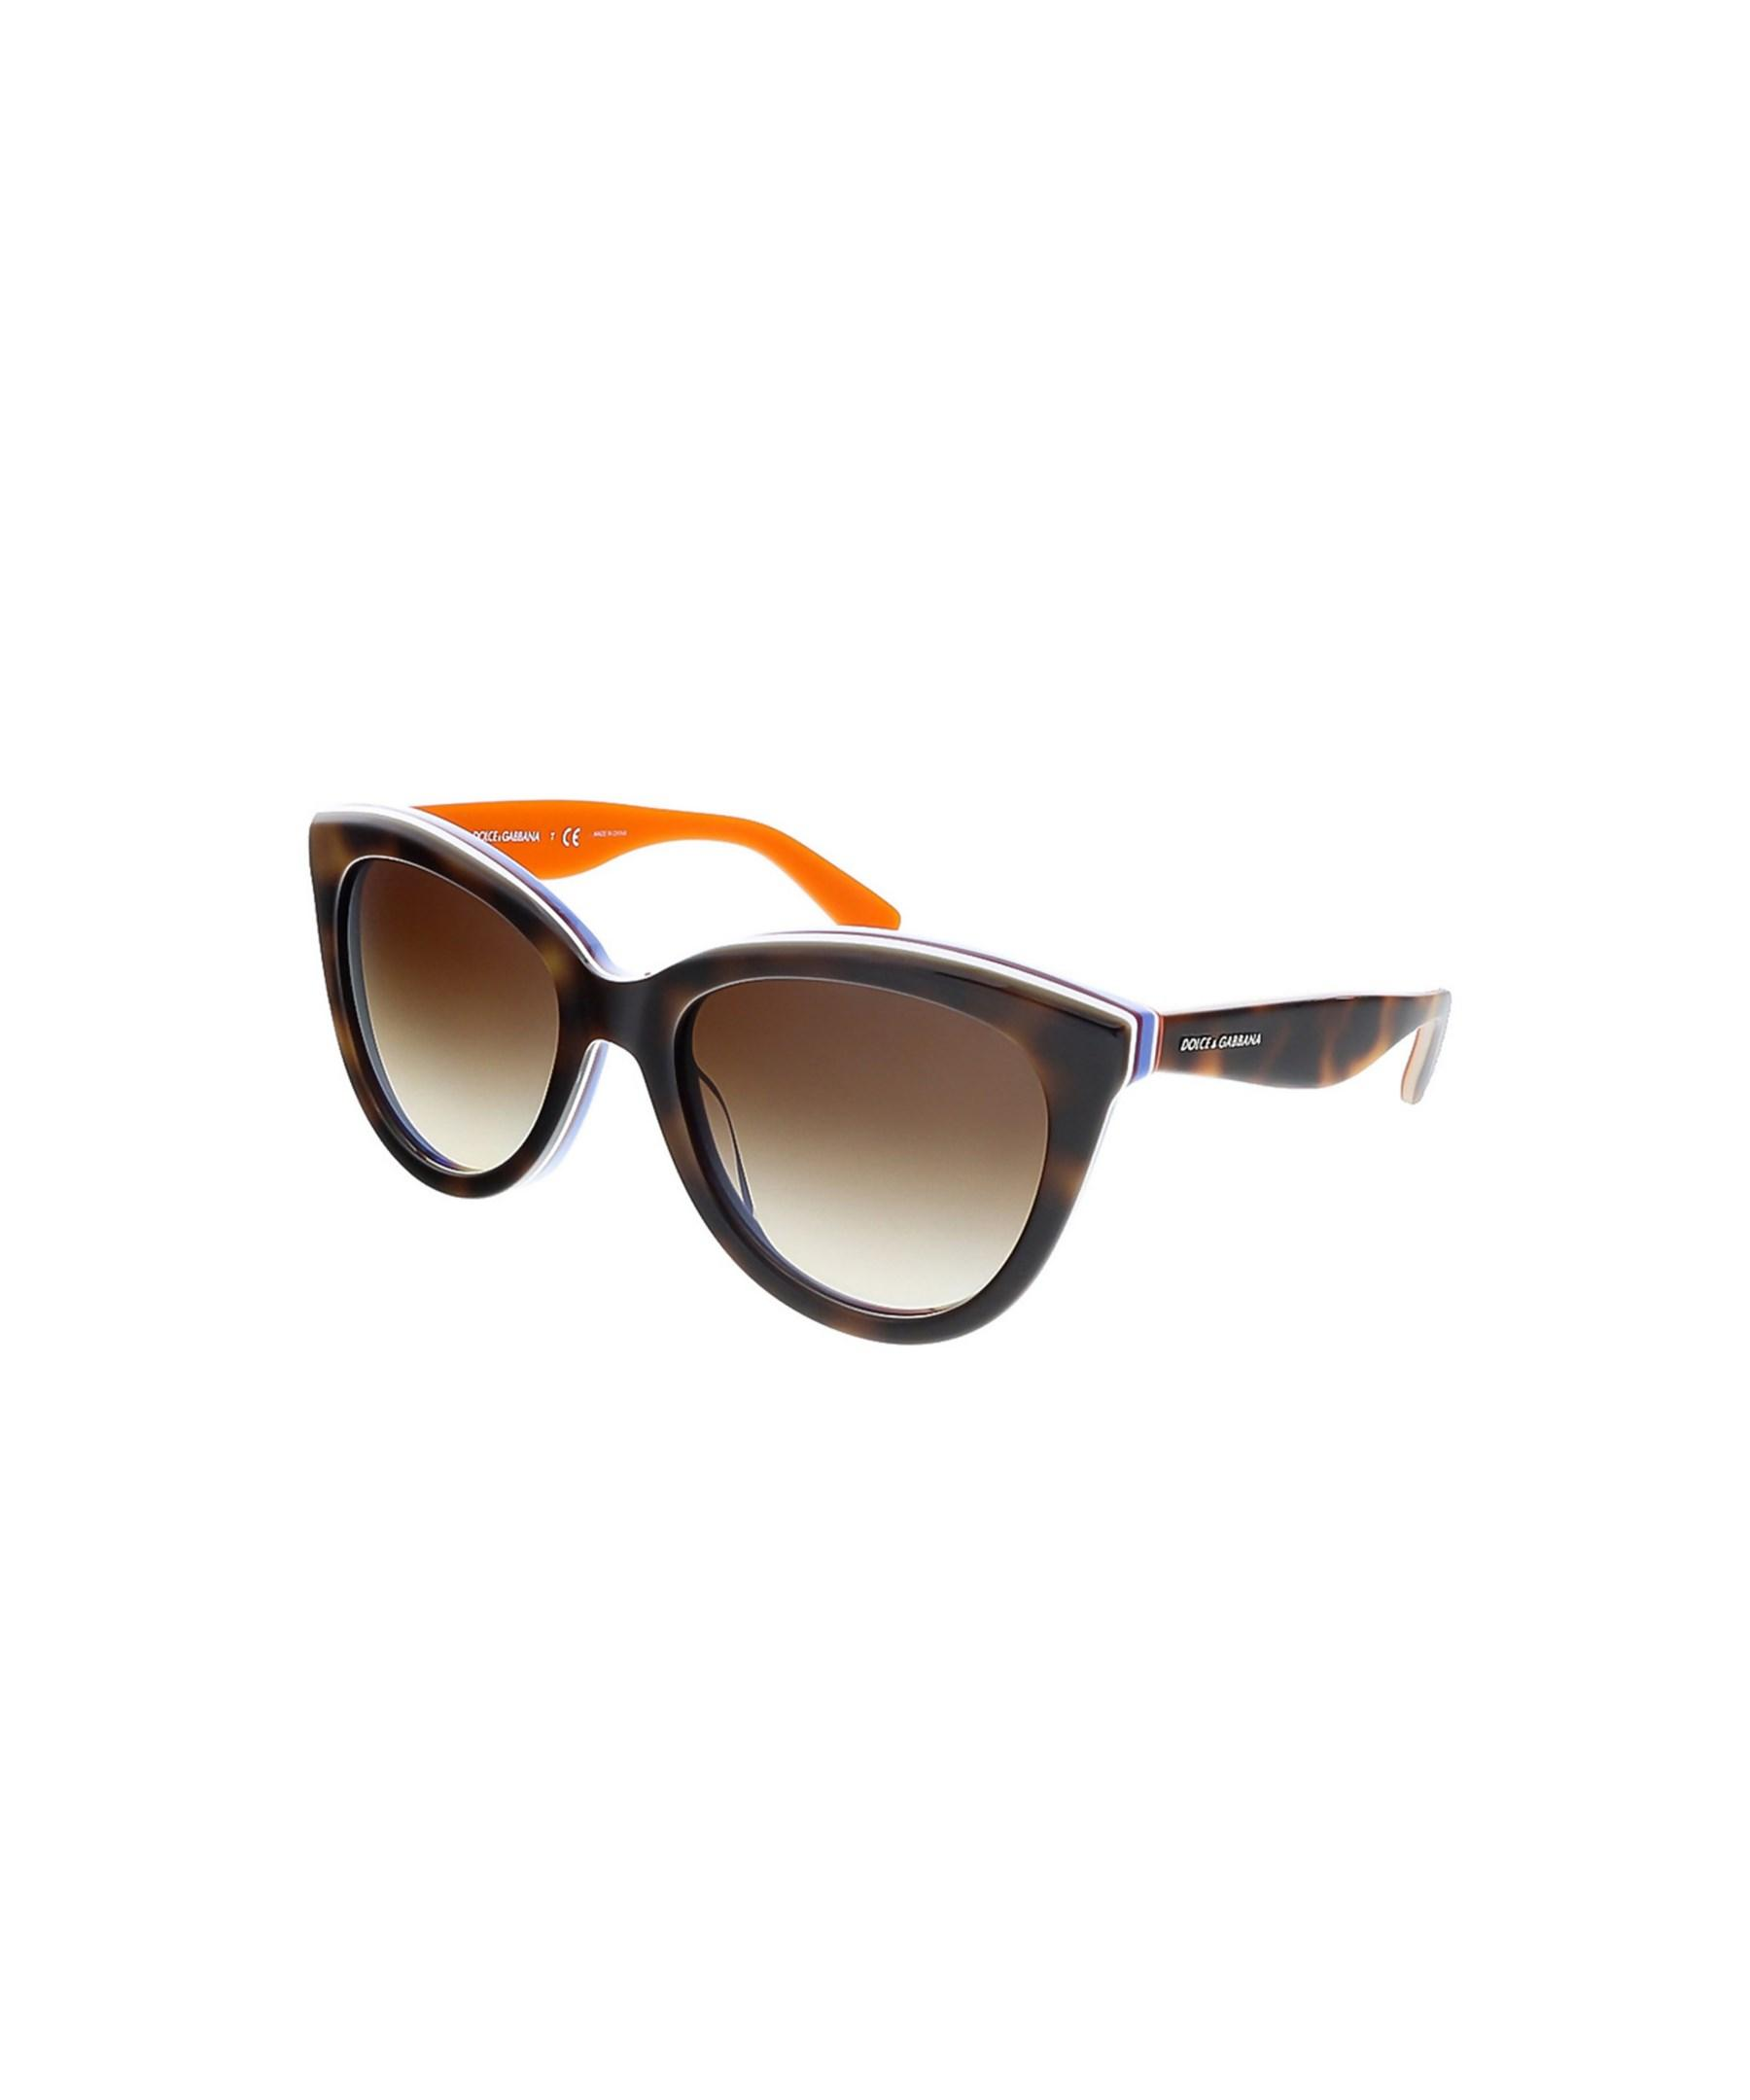 00f6b82994f Dolce And Gabbana Sunglasses Dg 4207